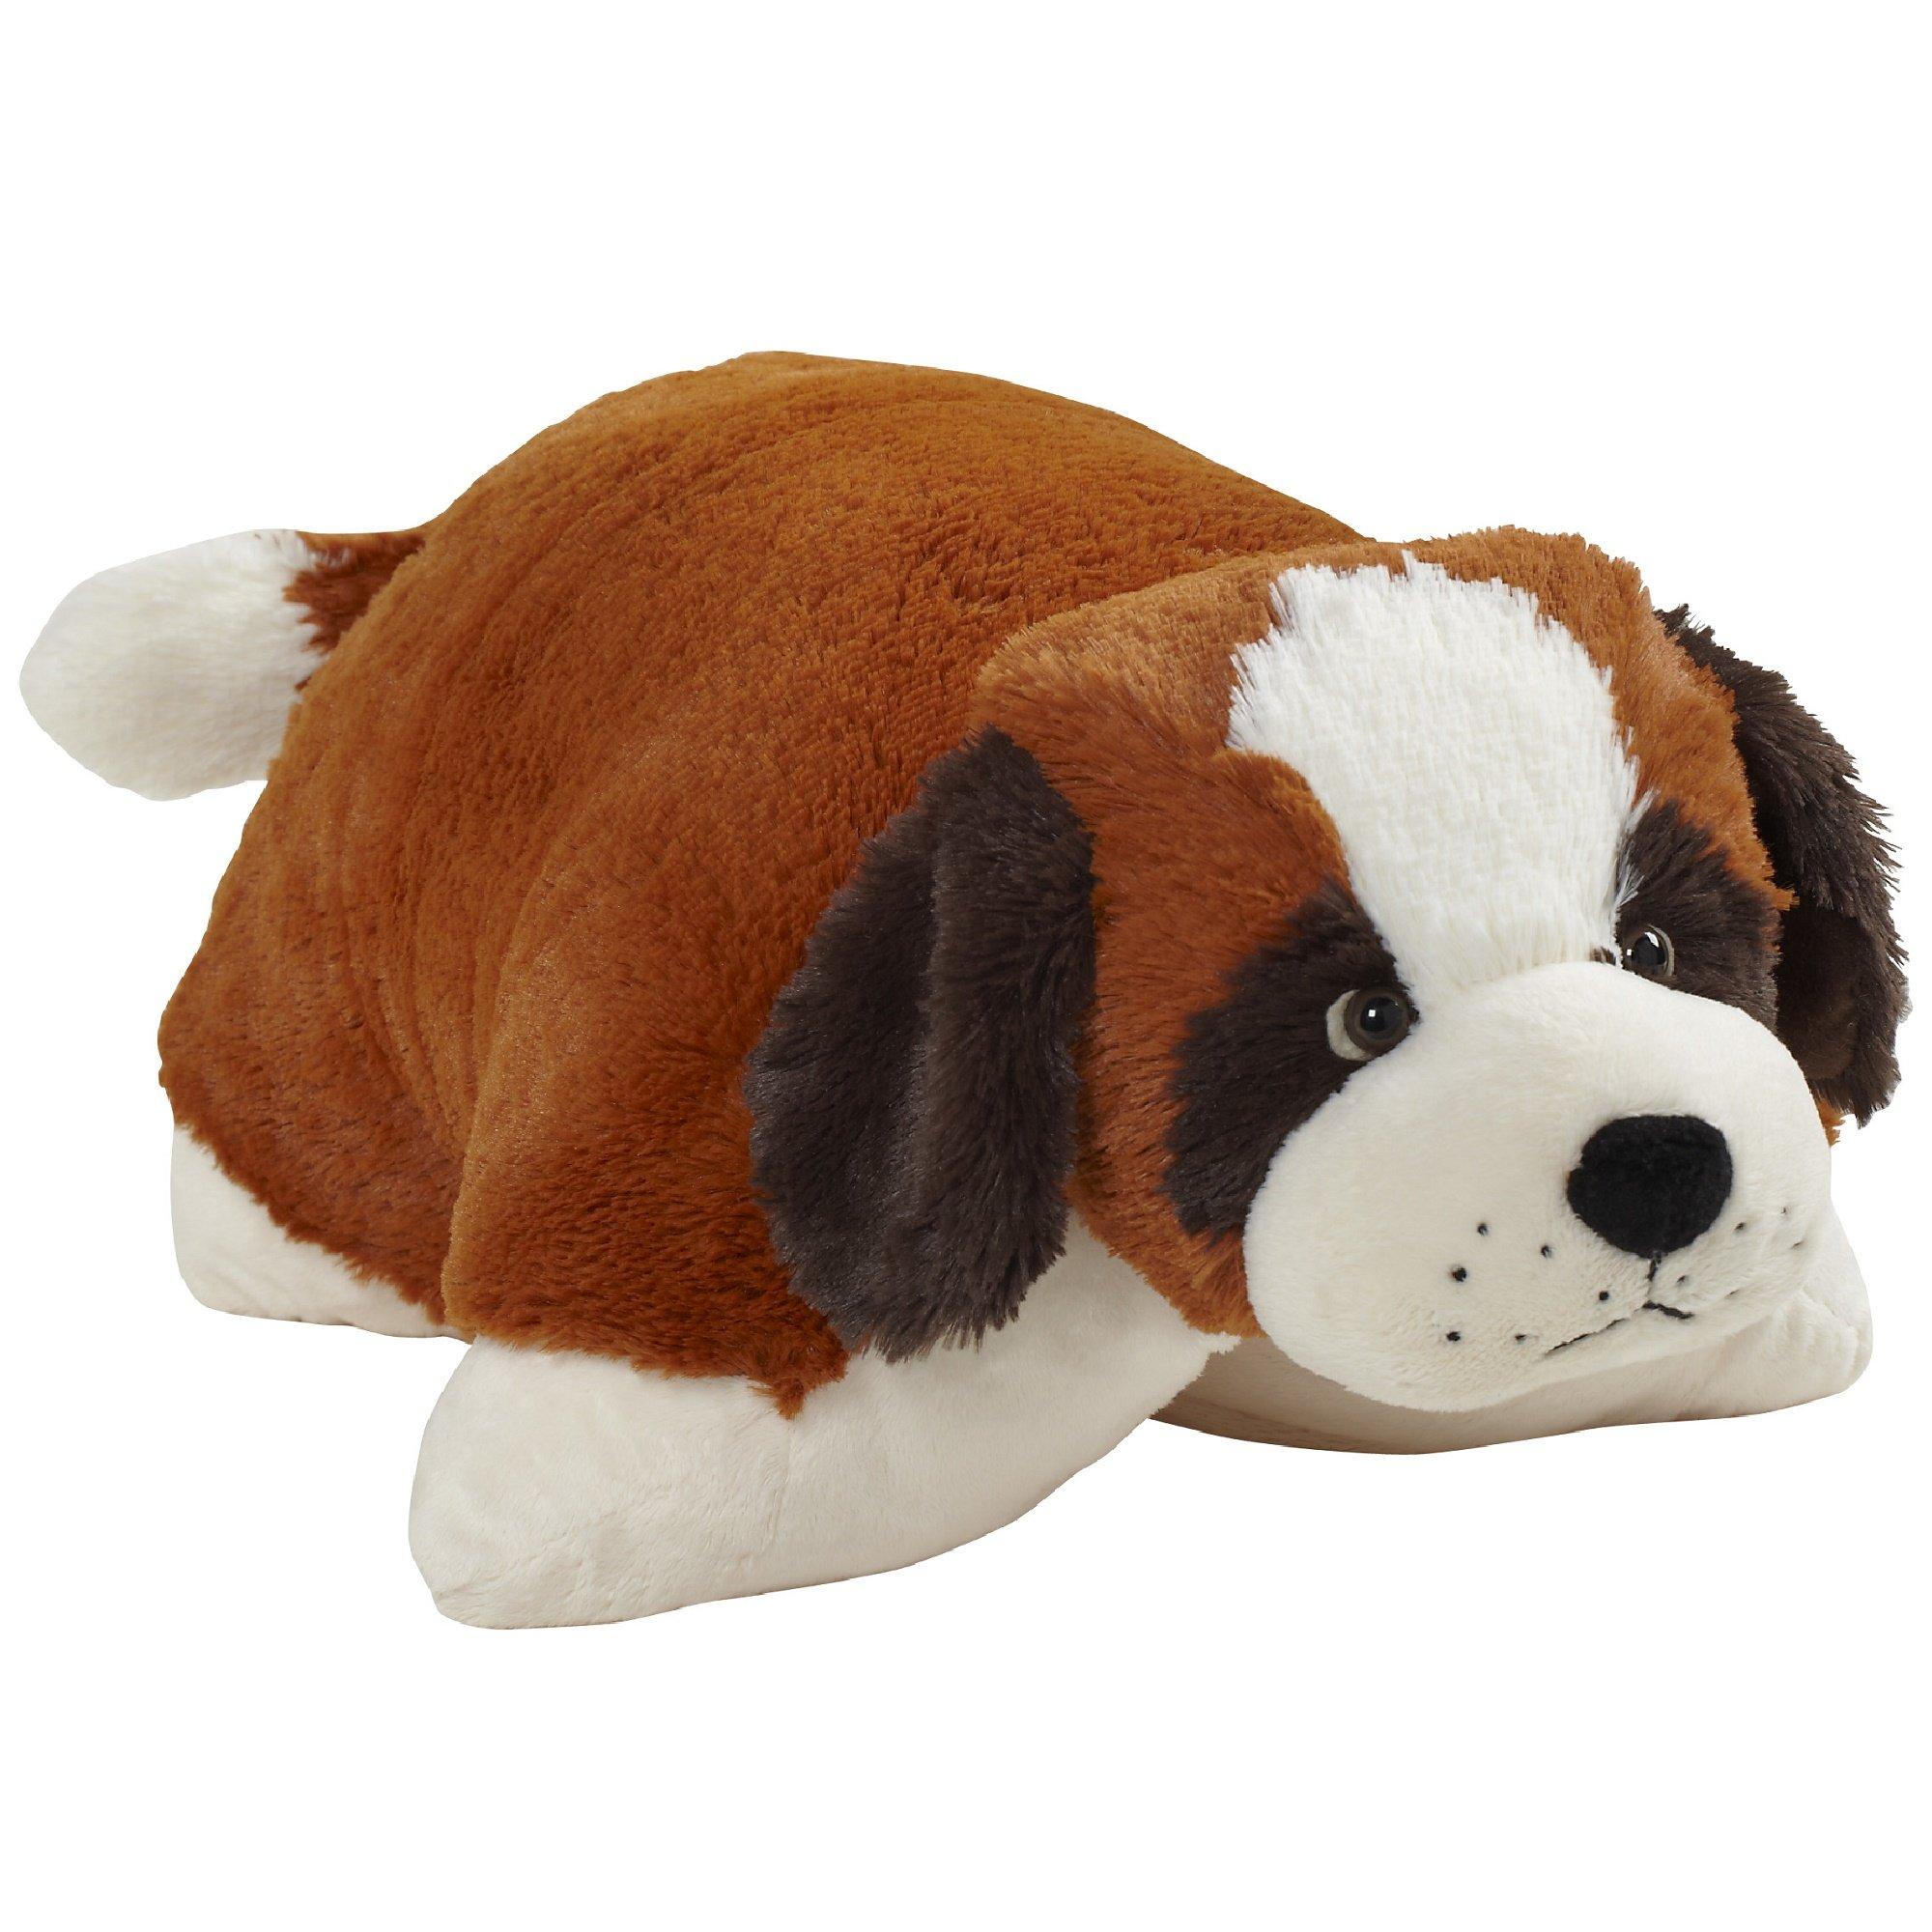 Pillow Pets 01300028T Signature, St. Bernard, Stuffed Animal Plush Toy, 18''